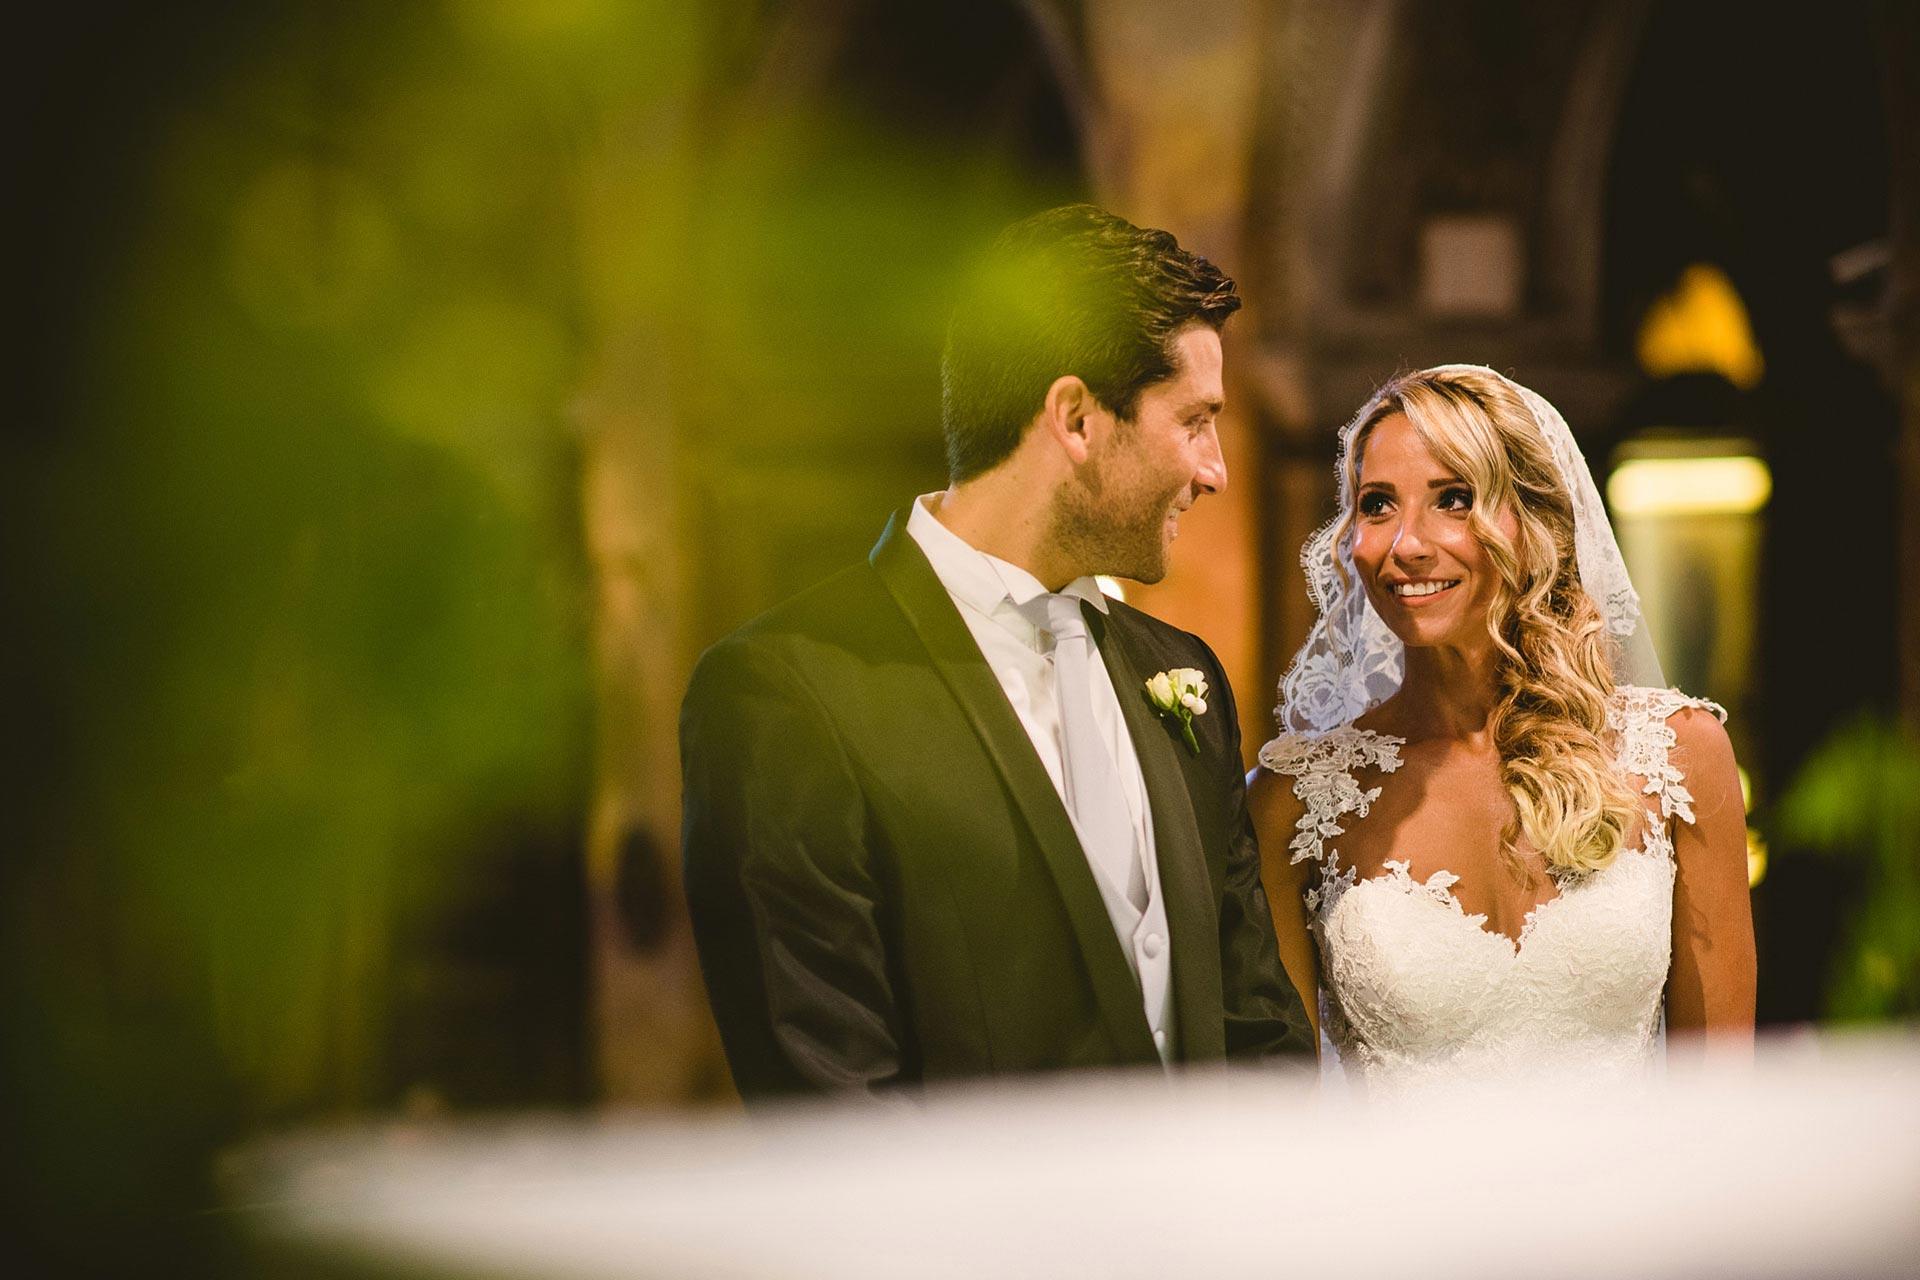 Vantaggi servizio fotografico matrimonio